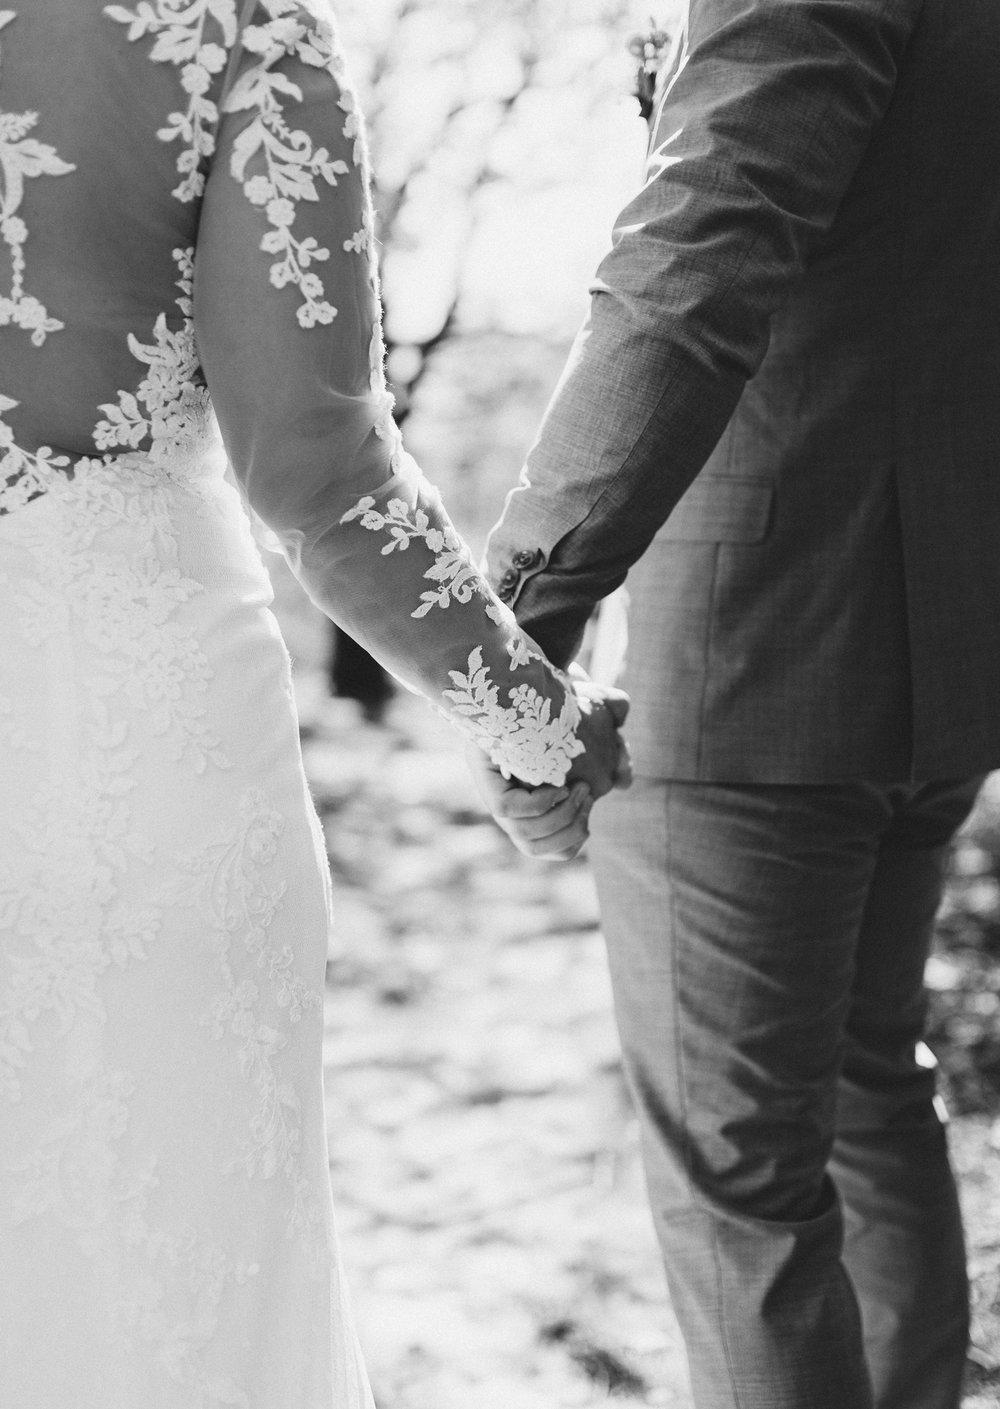 Bryllup-WEB-050518-134.jpg